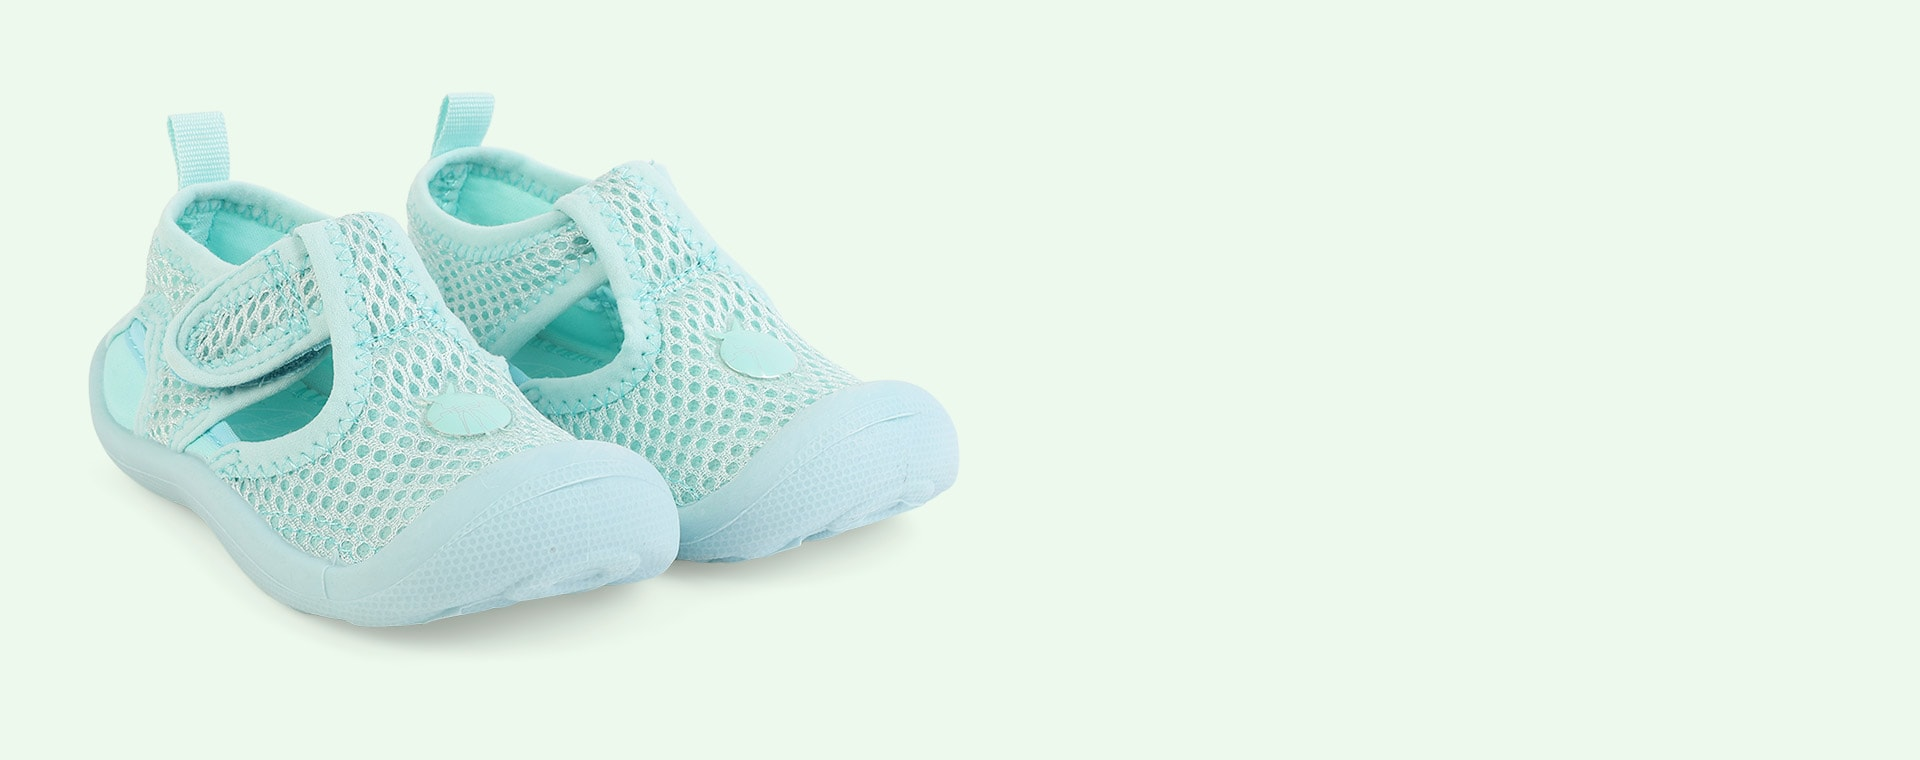 Mint Lassig Beach Sandals